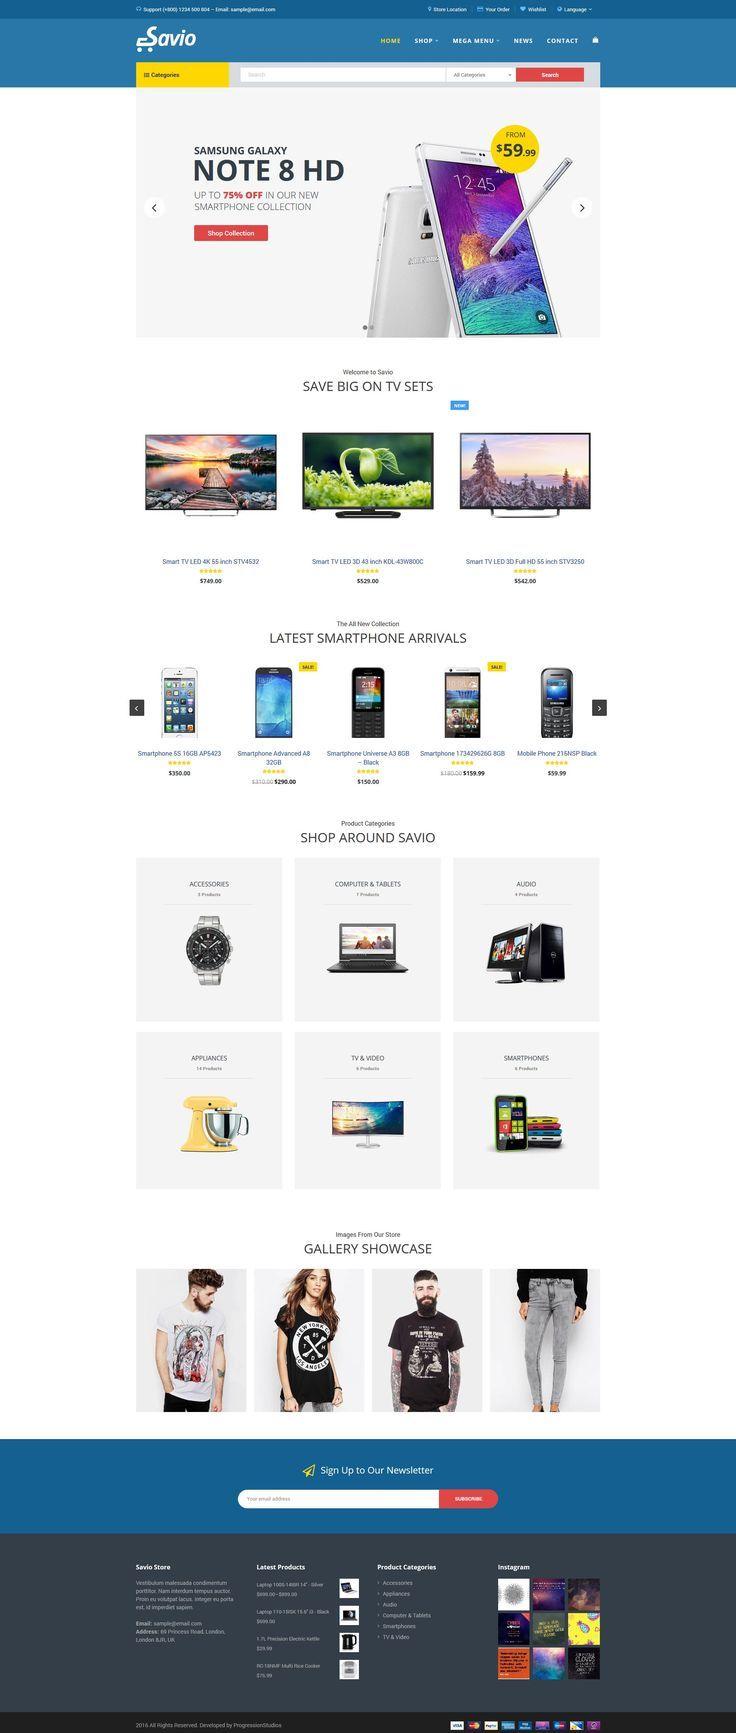 Savio - eCommerce Store Theme #store • Download ➝ https://themeforest.net/item/savio-ecommerce-store-theme/19389024?ref=rabosch